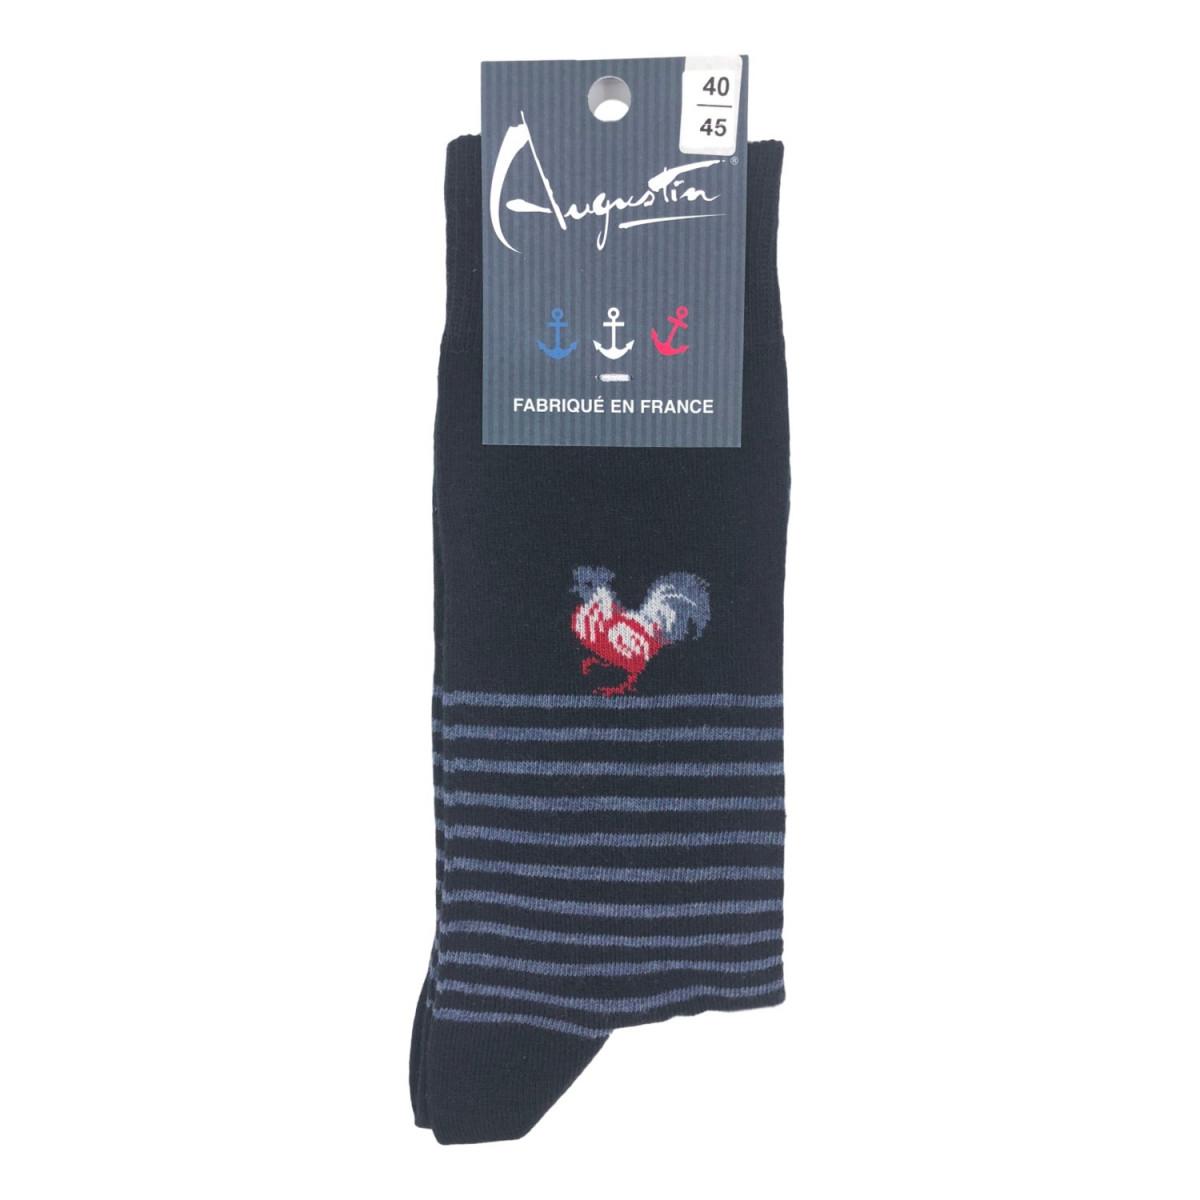 https://www.boutique-augustin.com/1640-thickbox/chaussettes-coq-francais-fabrication-francaise.jpg